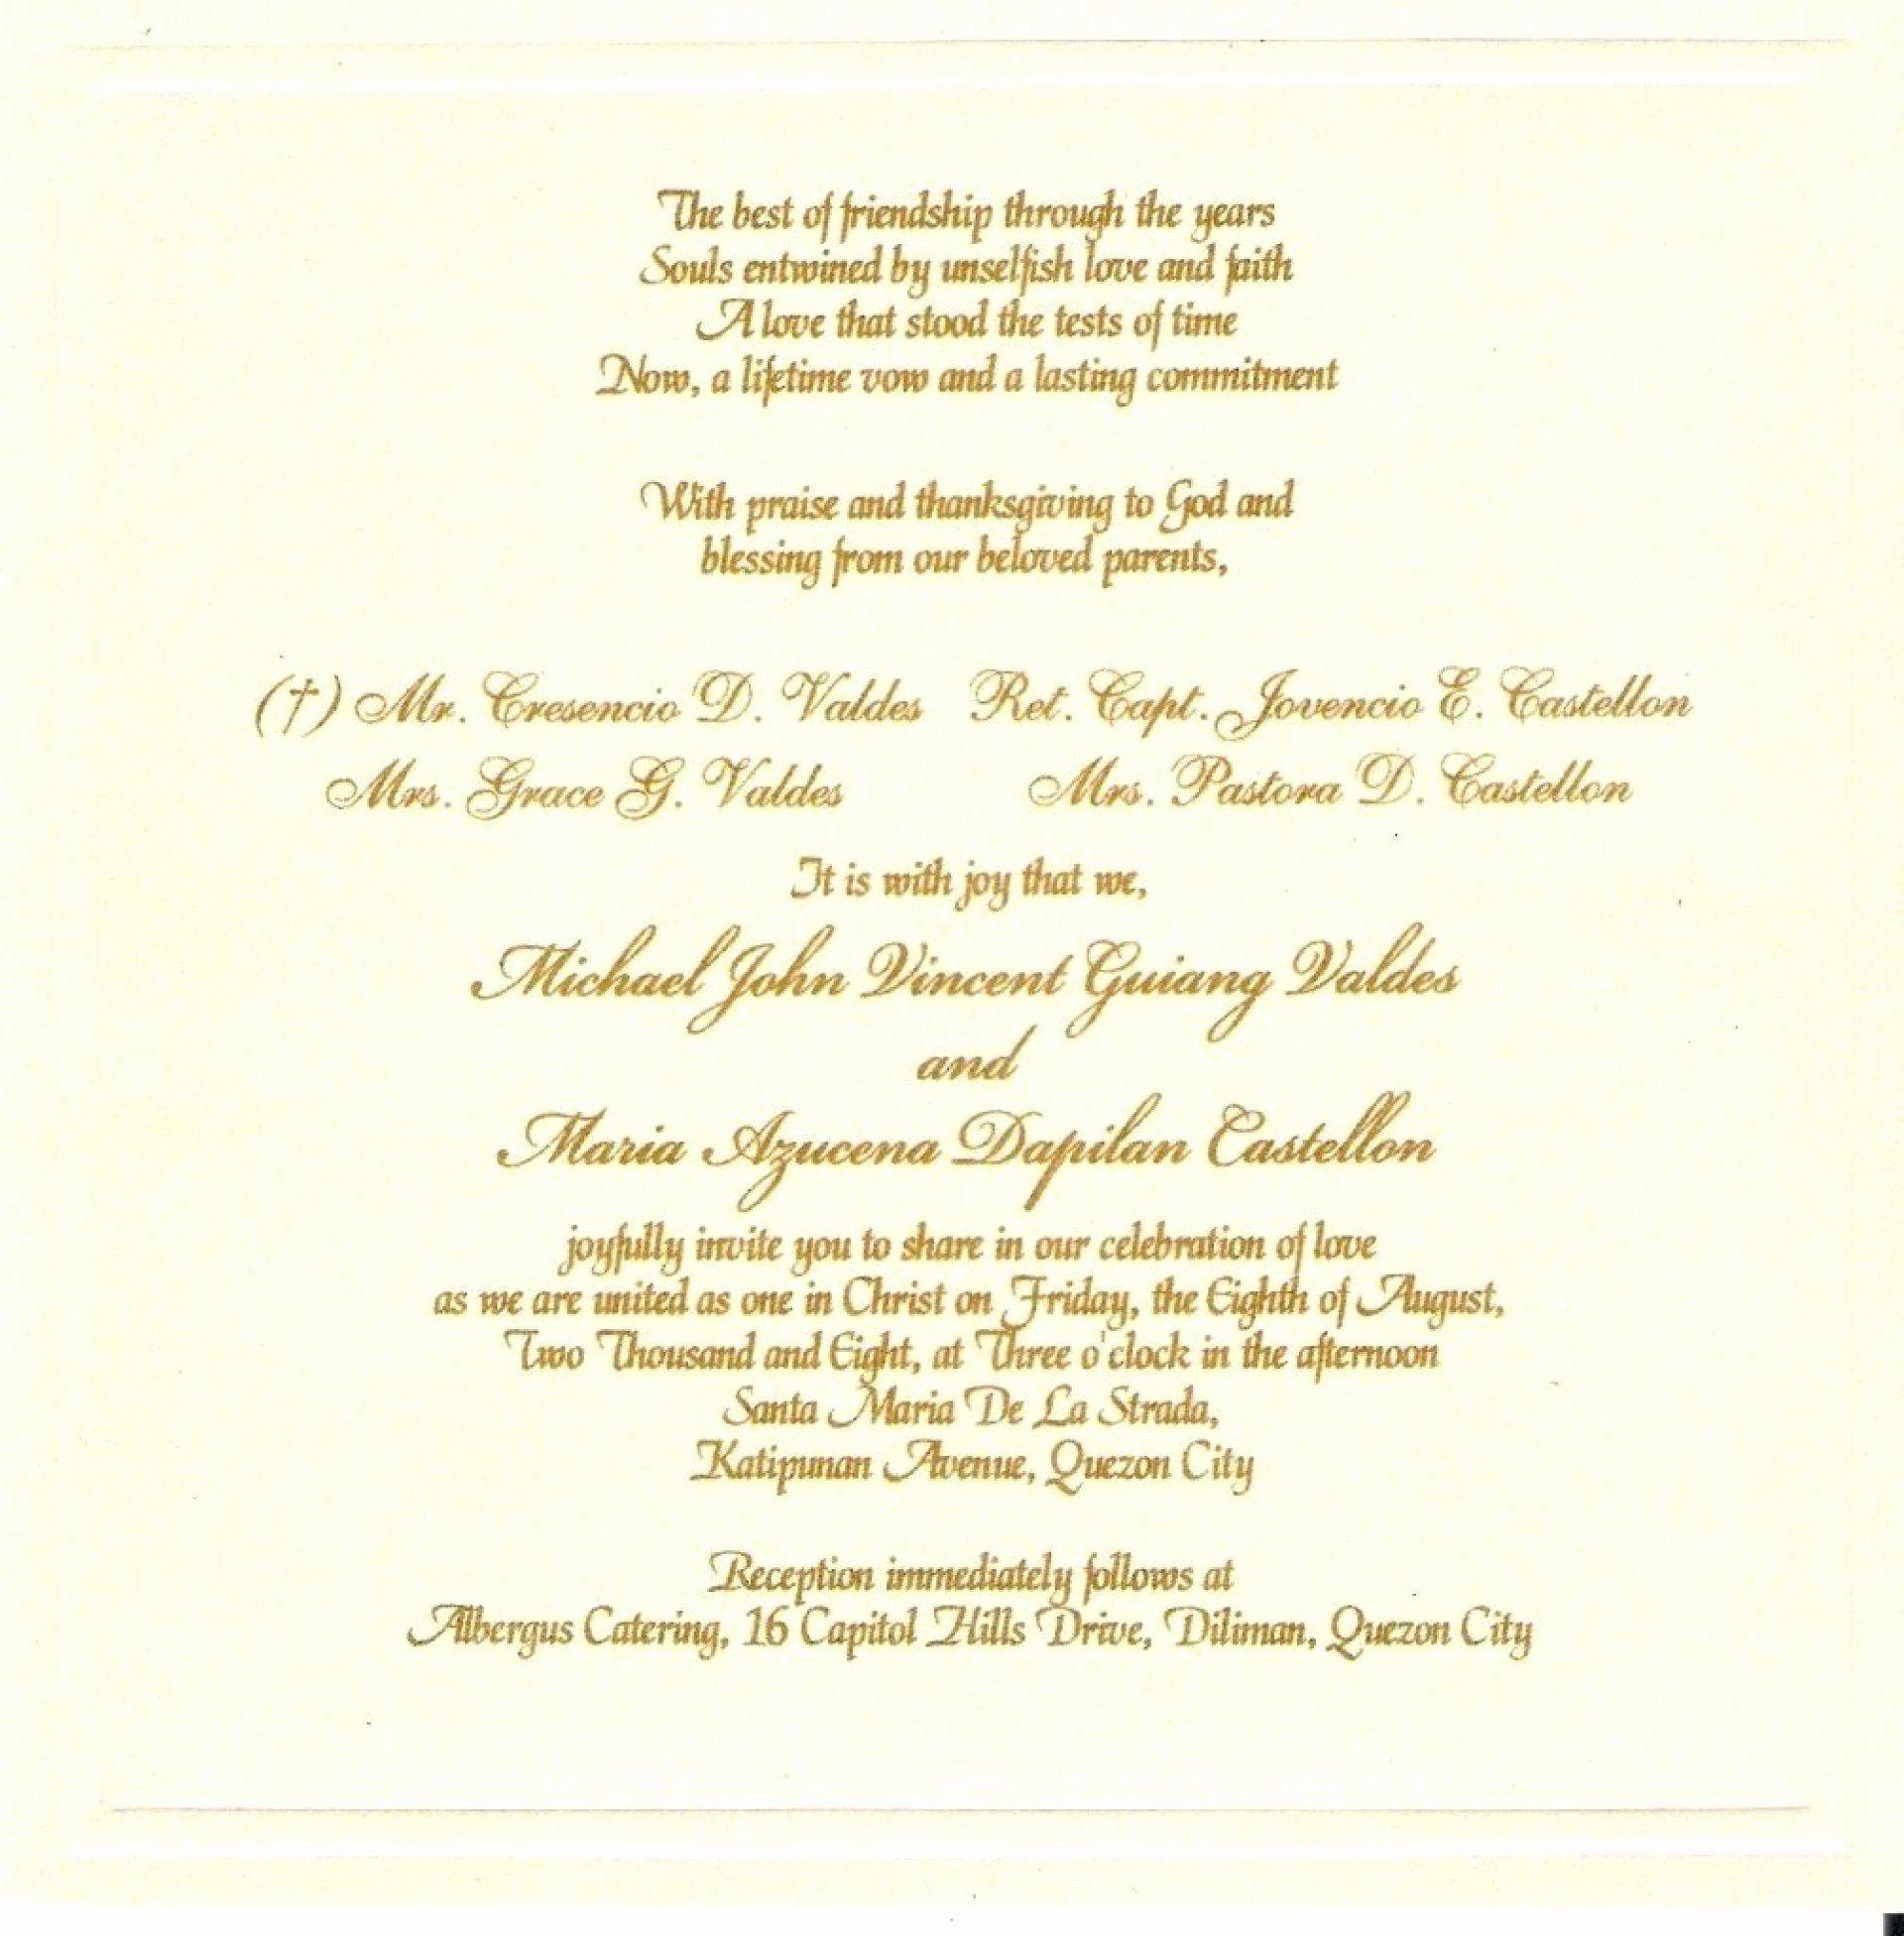 50th Wedding Anniversary Gift Etiquette: Christian Wedding Cards New 010 Template Ideas Wedding Inv